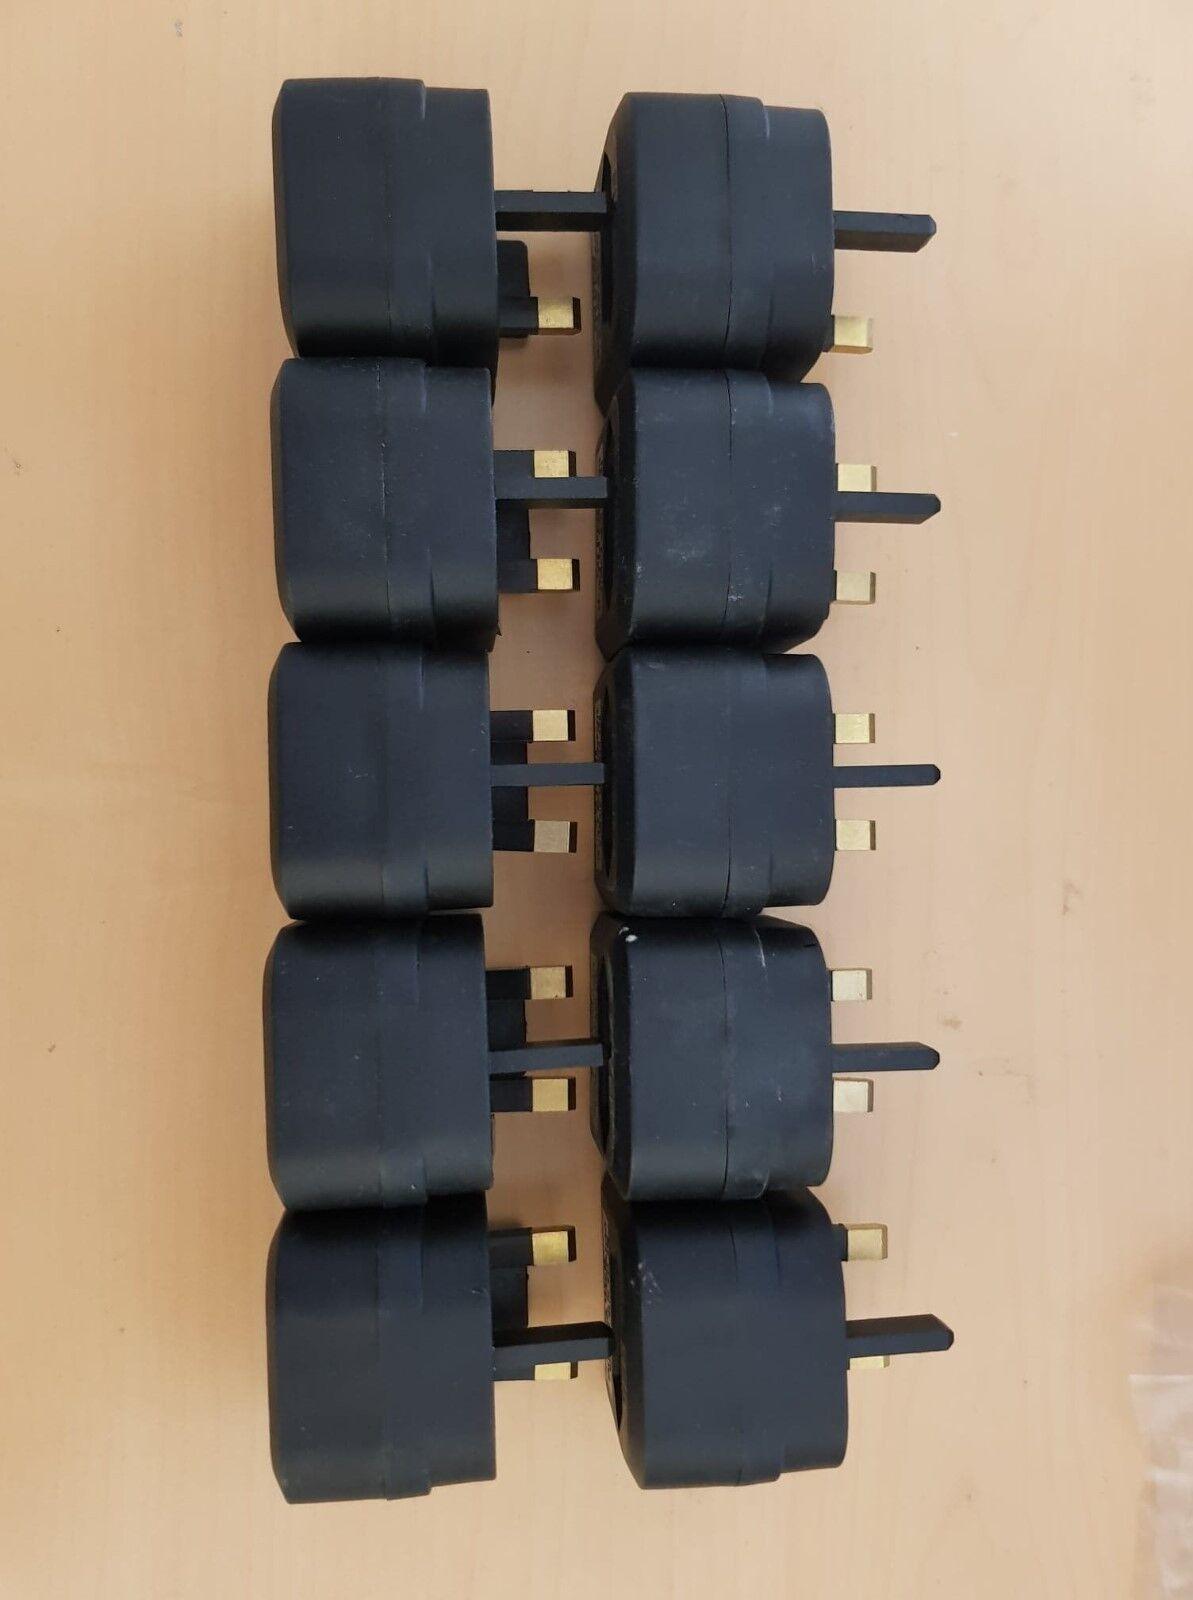 European 2 Pin UK 3 3 3 Broches Adaptateur-EU to UK Adaptateur 4672f4